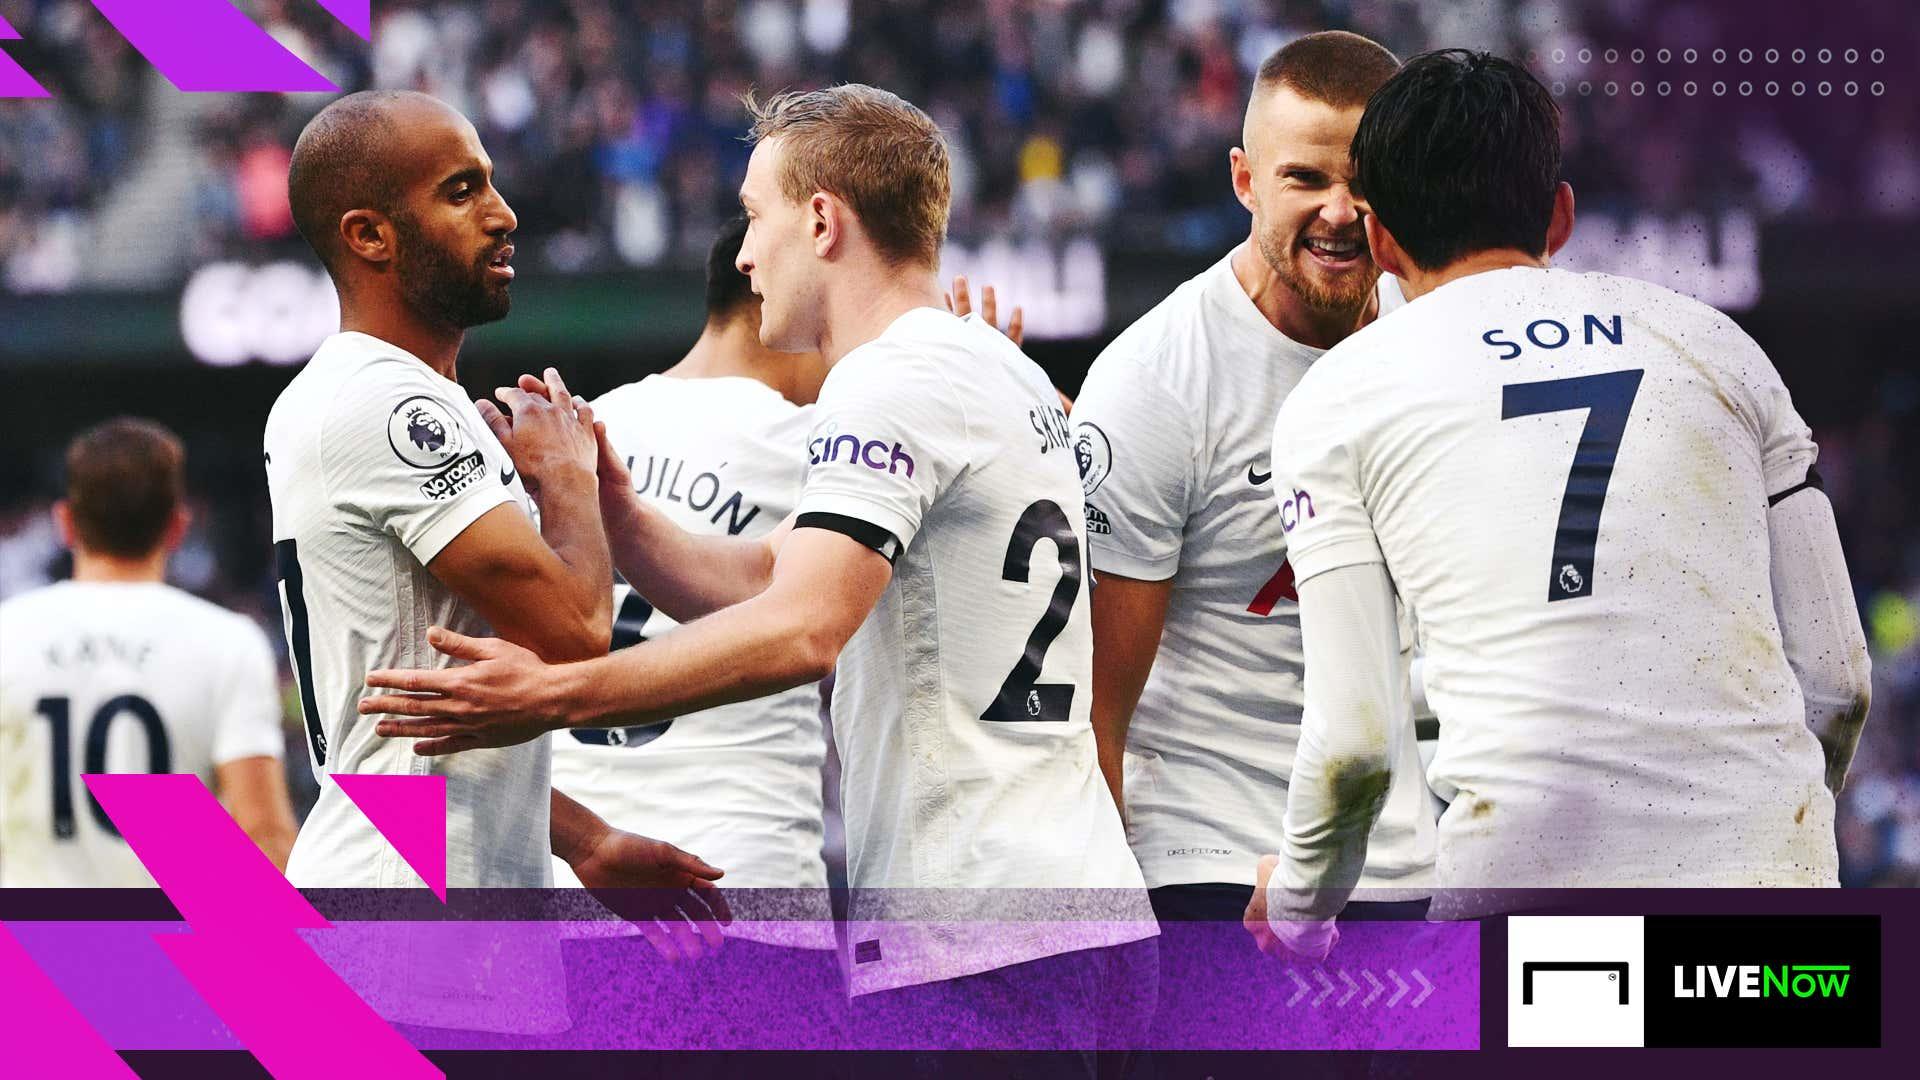 Watch West Ham vs Tottenham Hotspur on LIVENow